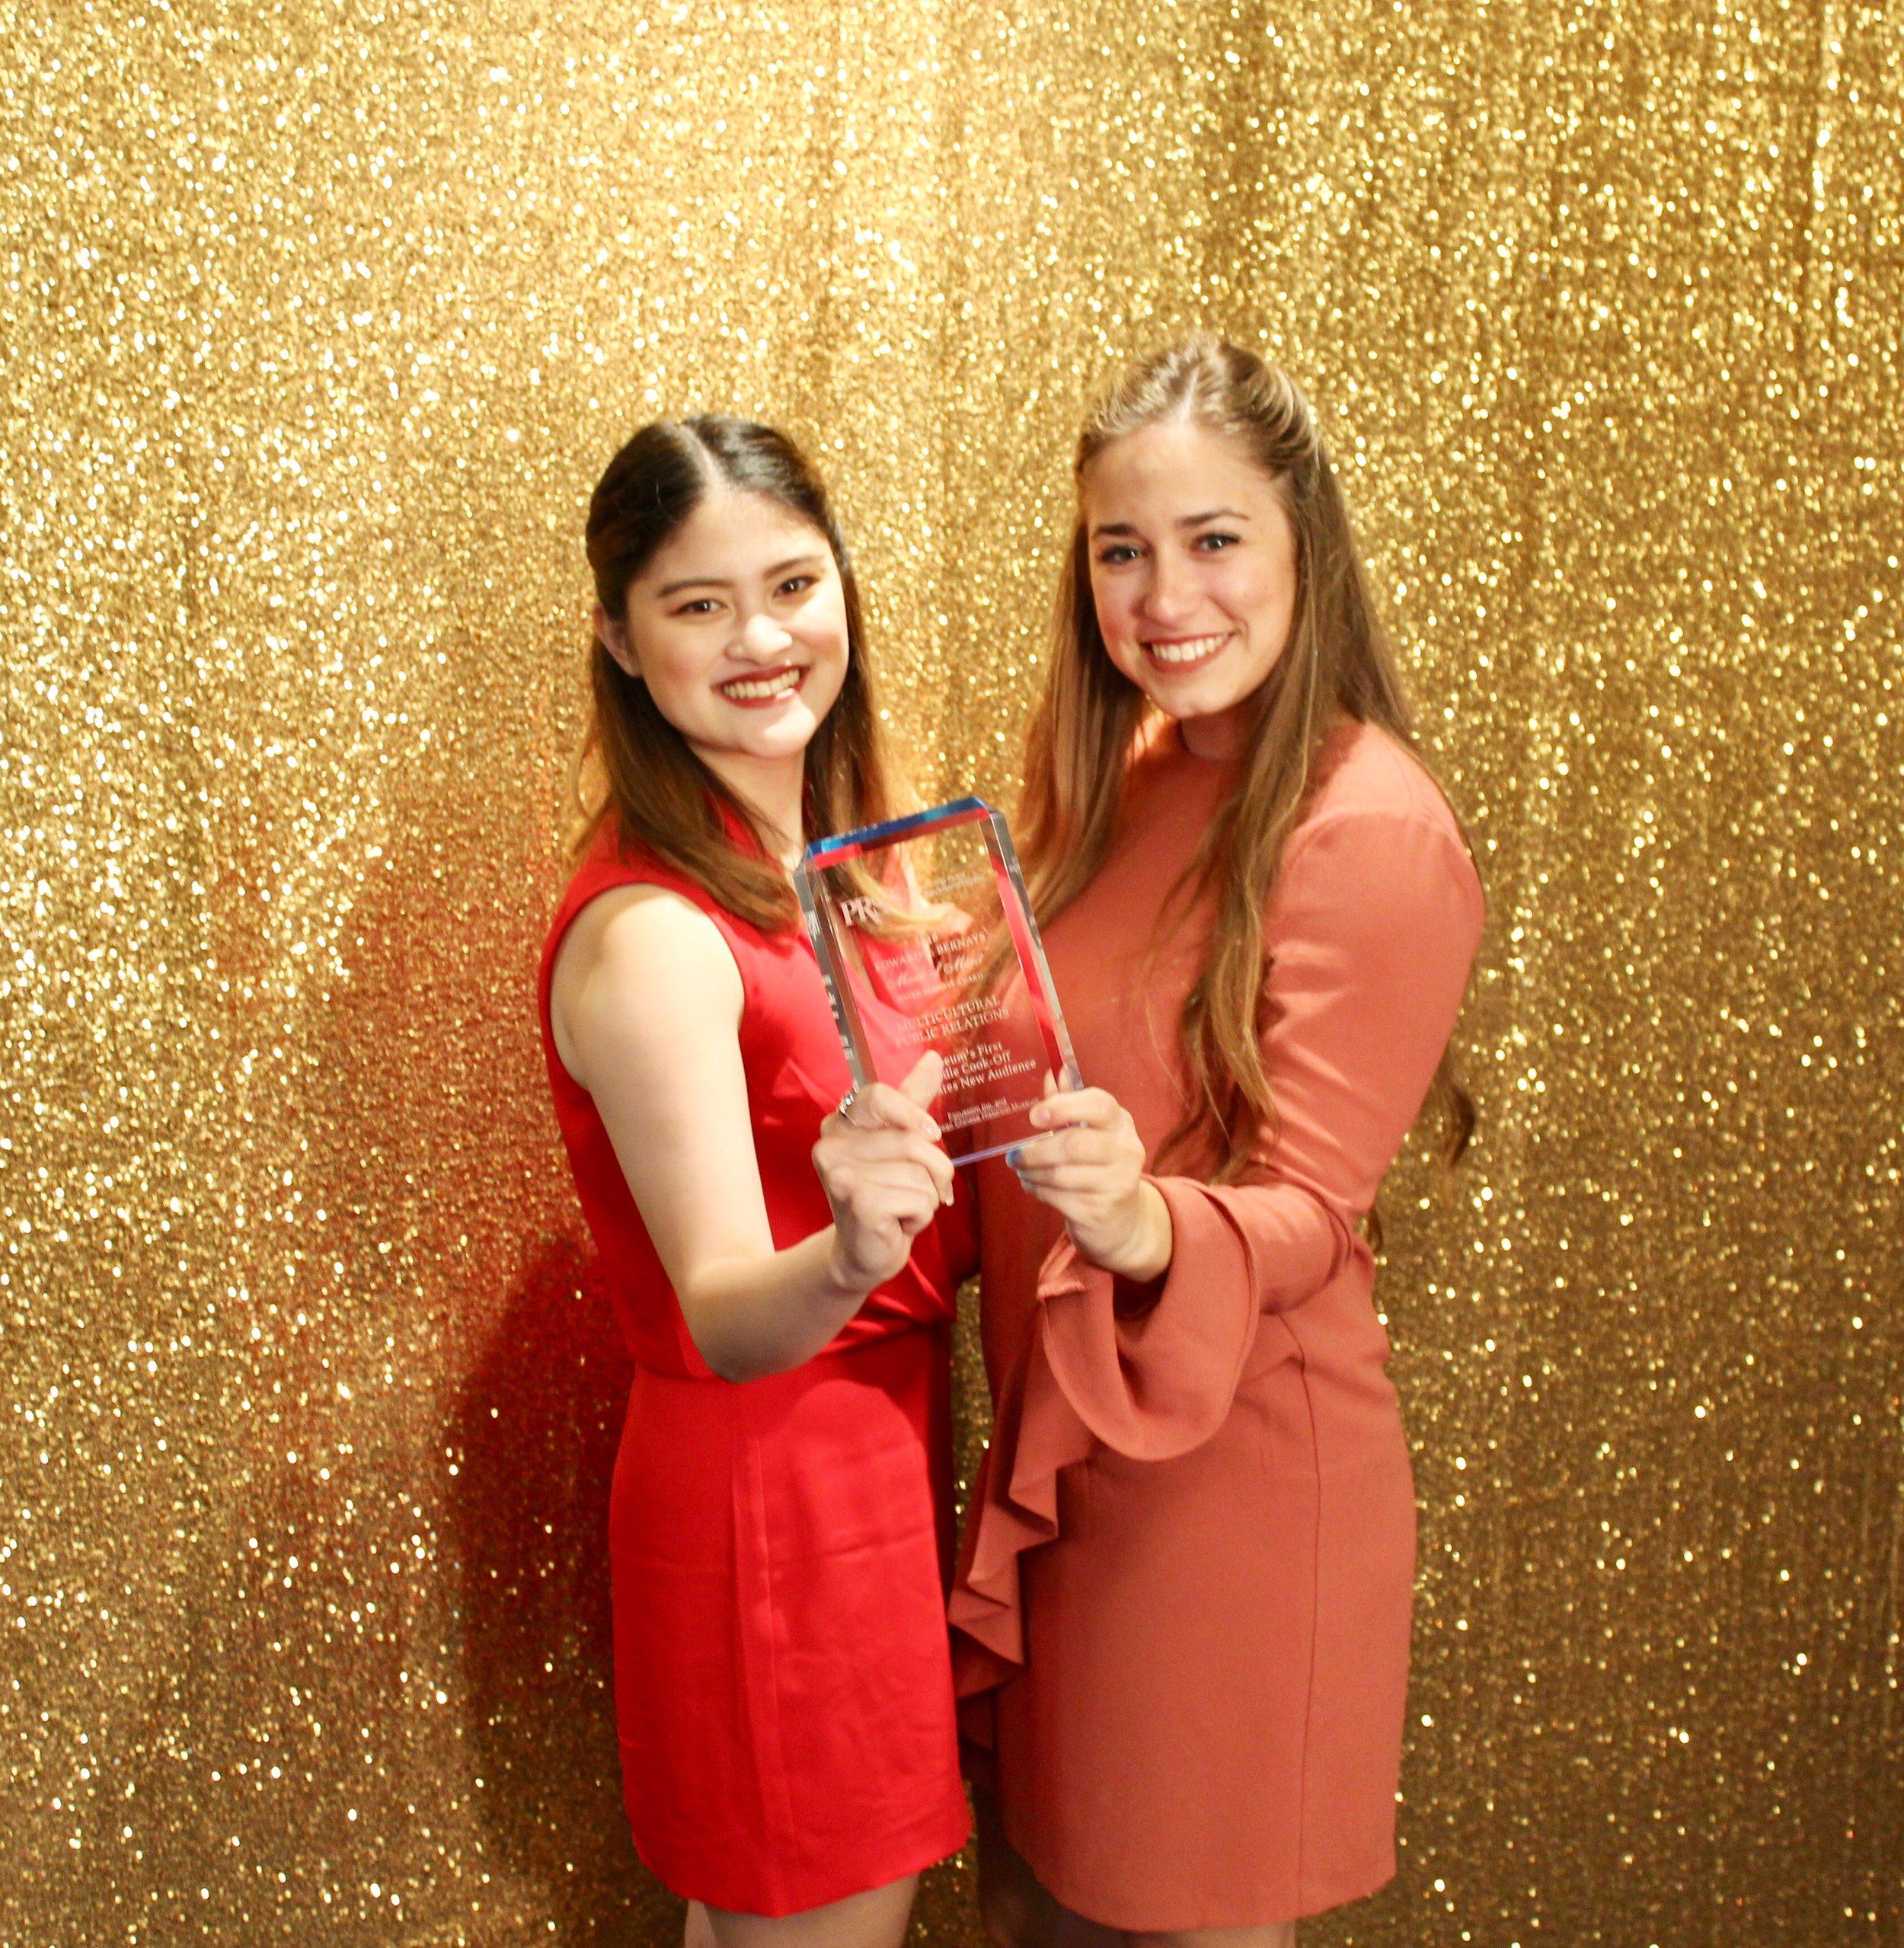 Andie Unson & Olivia Stafford